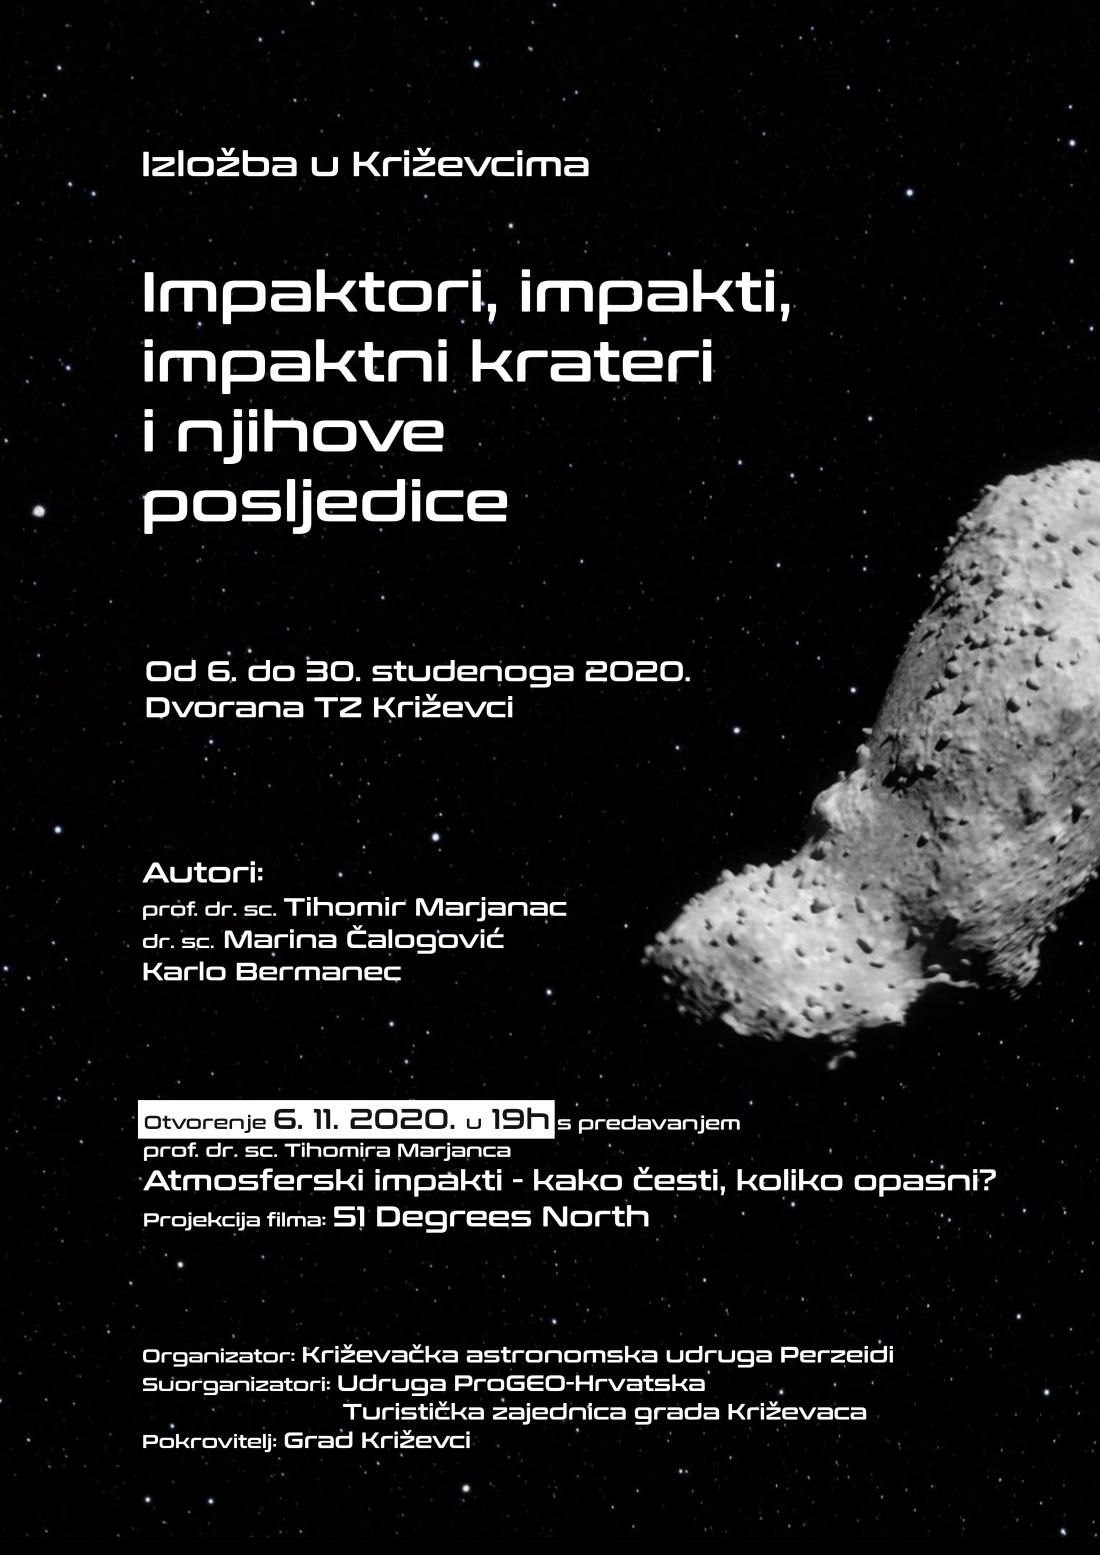 poster_izlozbe_small